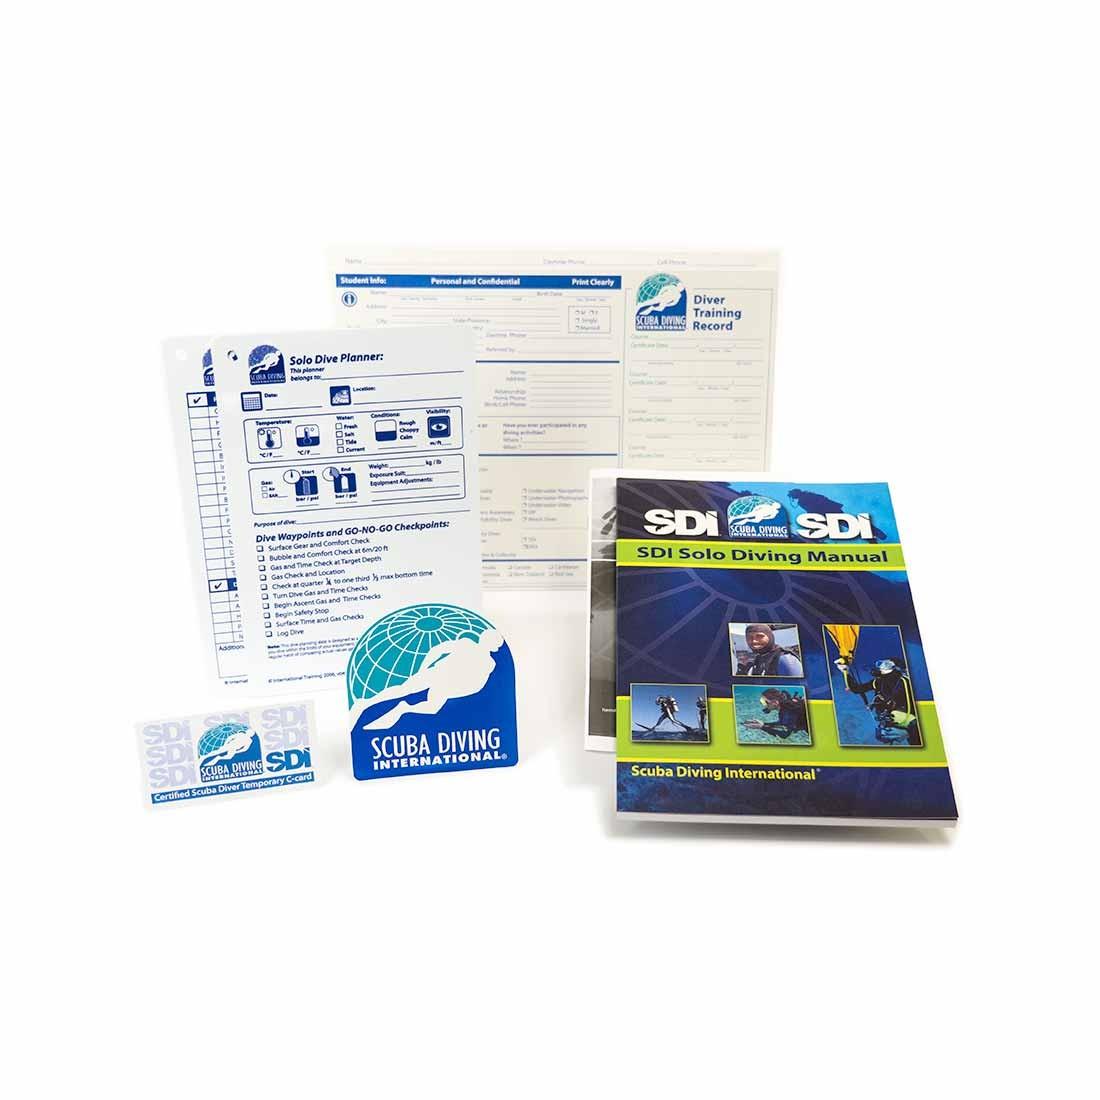 SDI Solo Student Kit